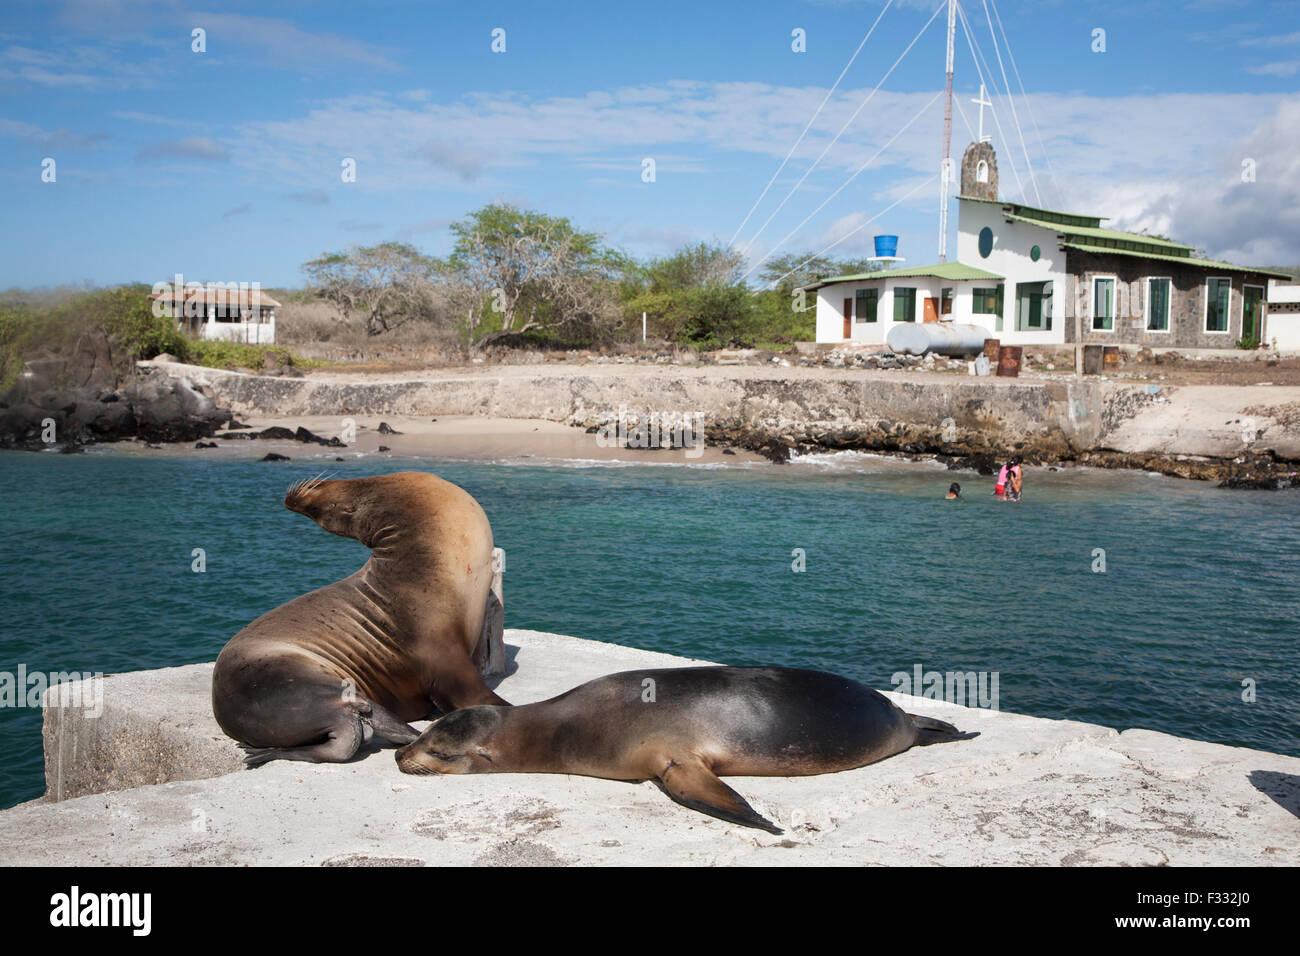 Galapagos Sea Lions (Zalophus wollebaeki) snoozing on the dock at Puerto Velasco Ibarra, Floreana Island - Stock Image